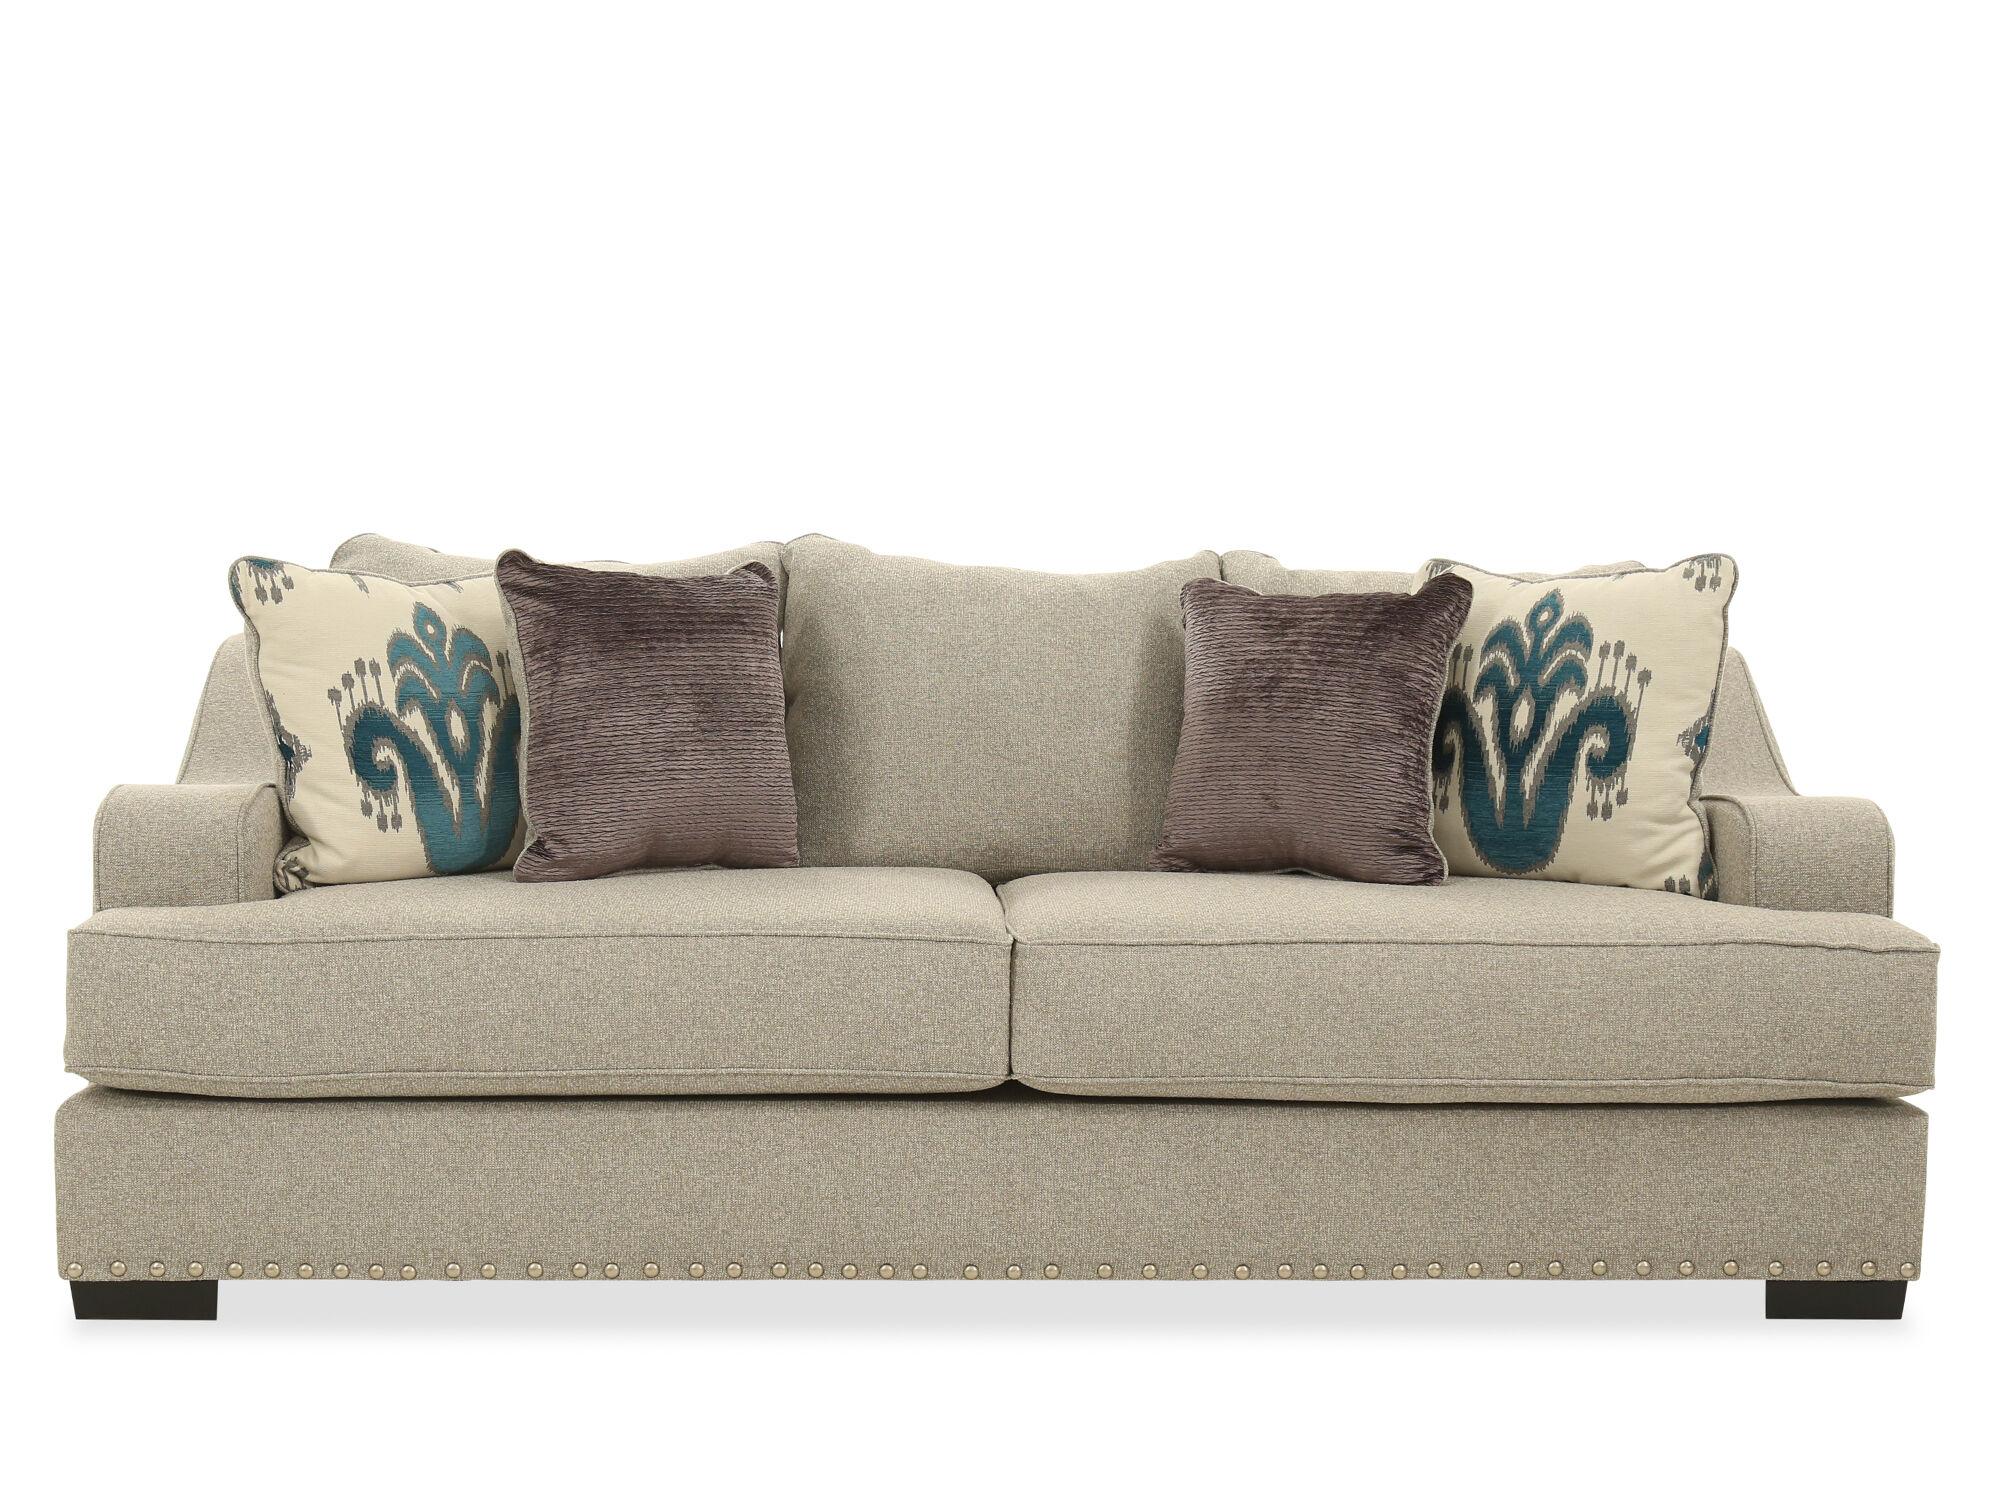 michael nicholas aspen sofa stanley showroom in bangalore low profile nailhead accented 96 quot beige mathis